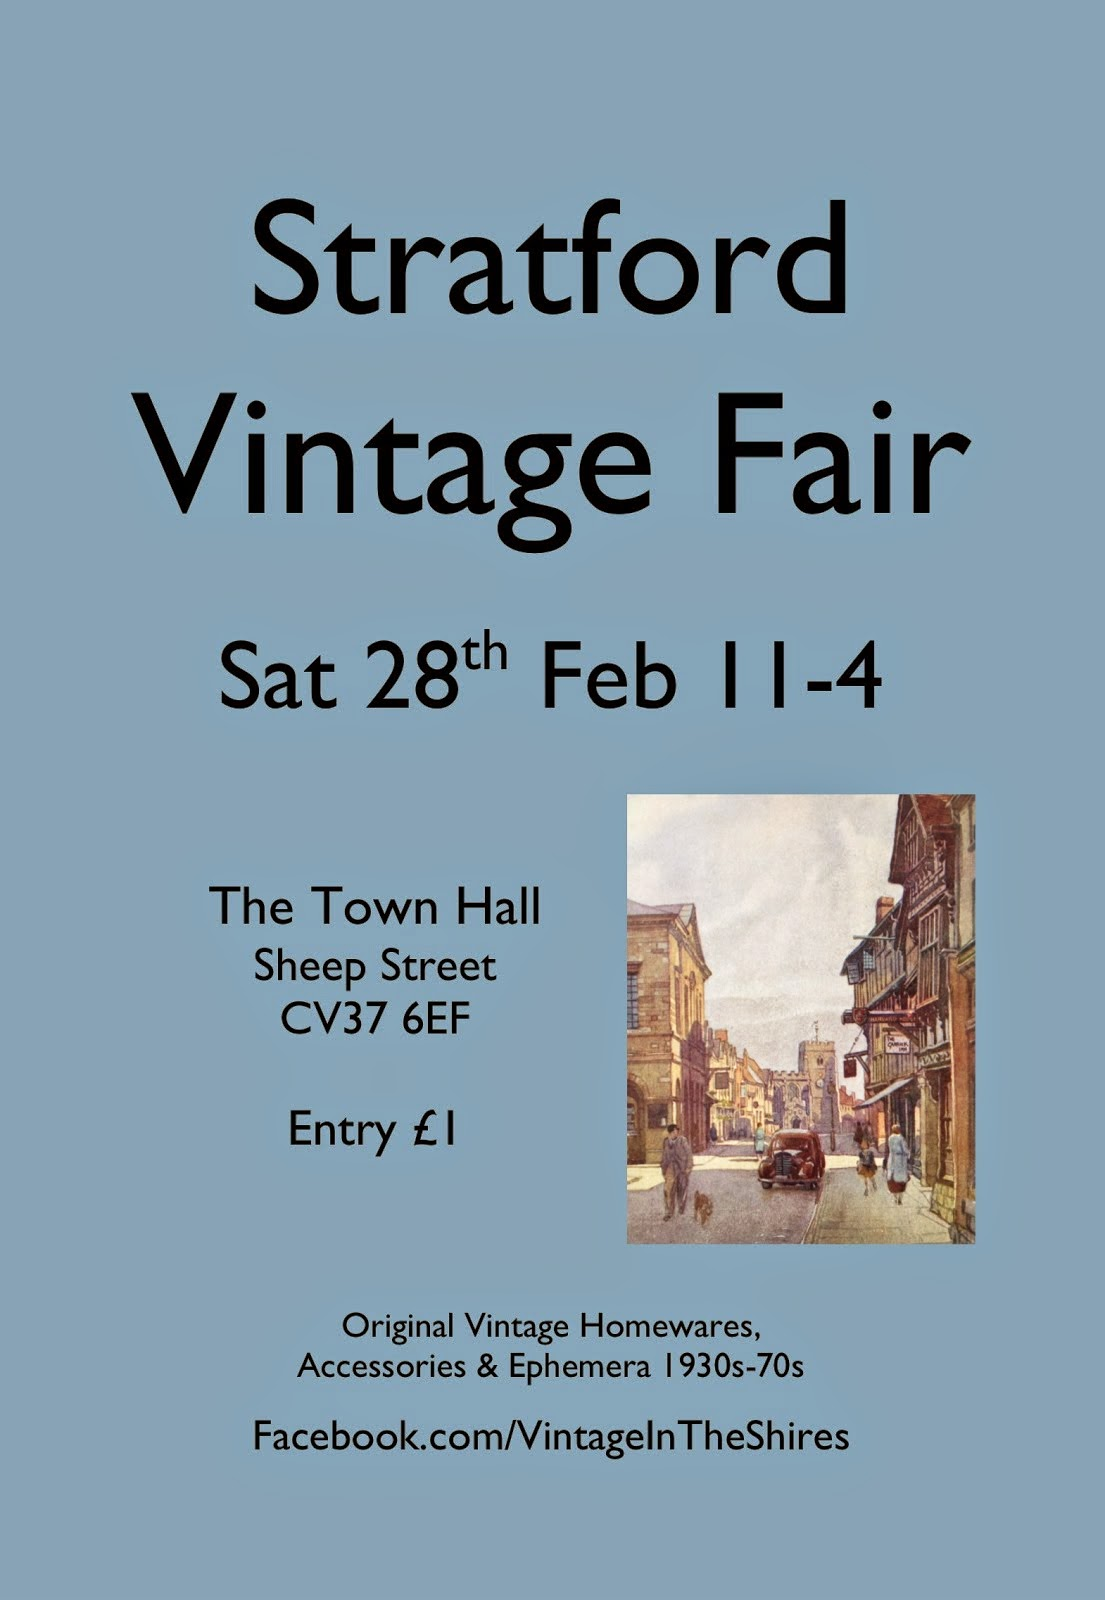 The Stratford Vintage Fair